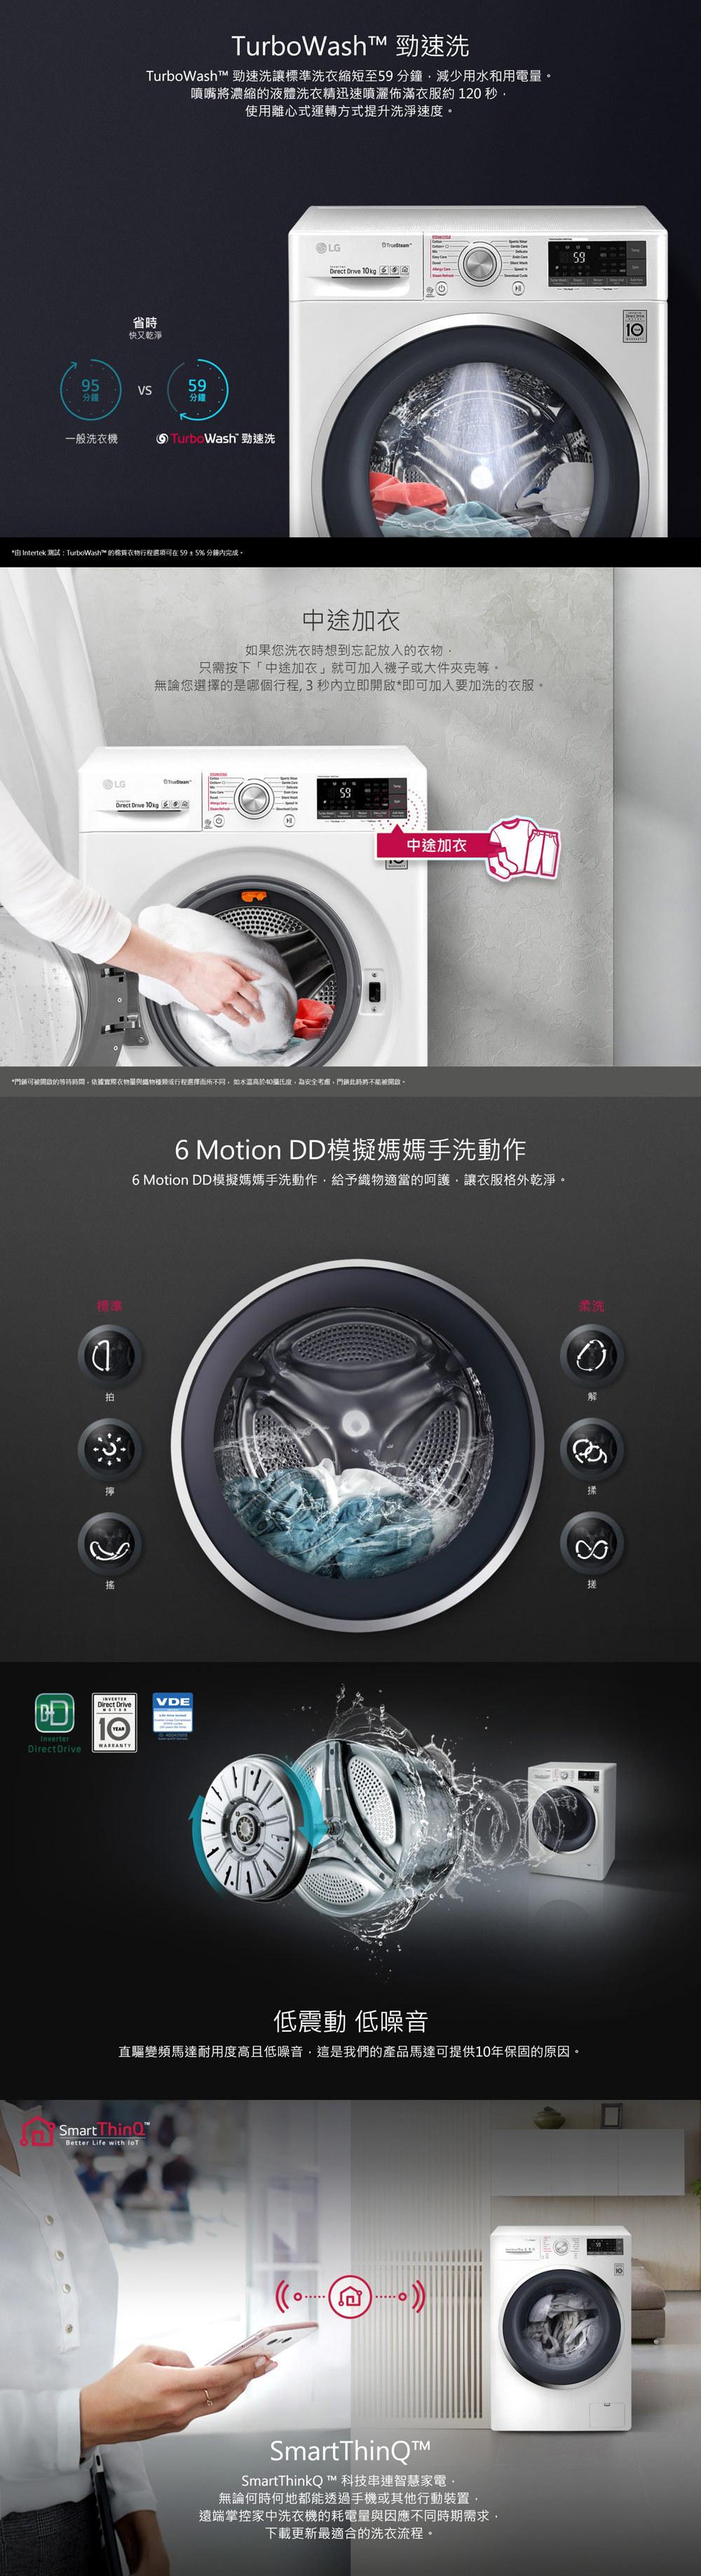 LG 樂金 WD-S105CW 洗衣機 10.5kg 6MOTION DD  蒸洗脫